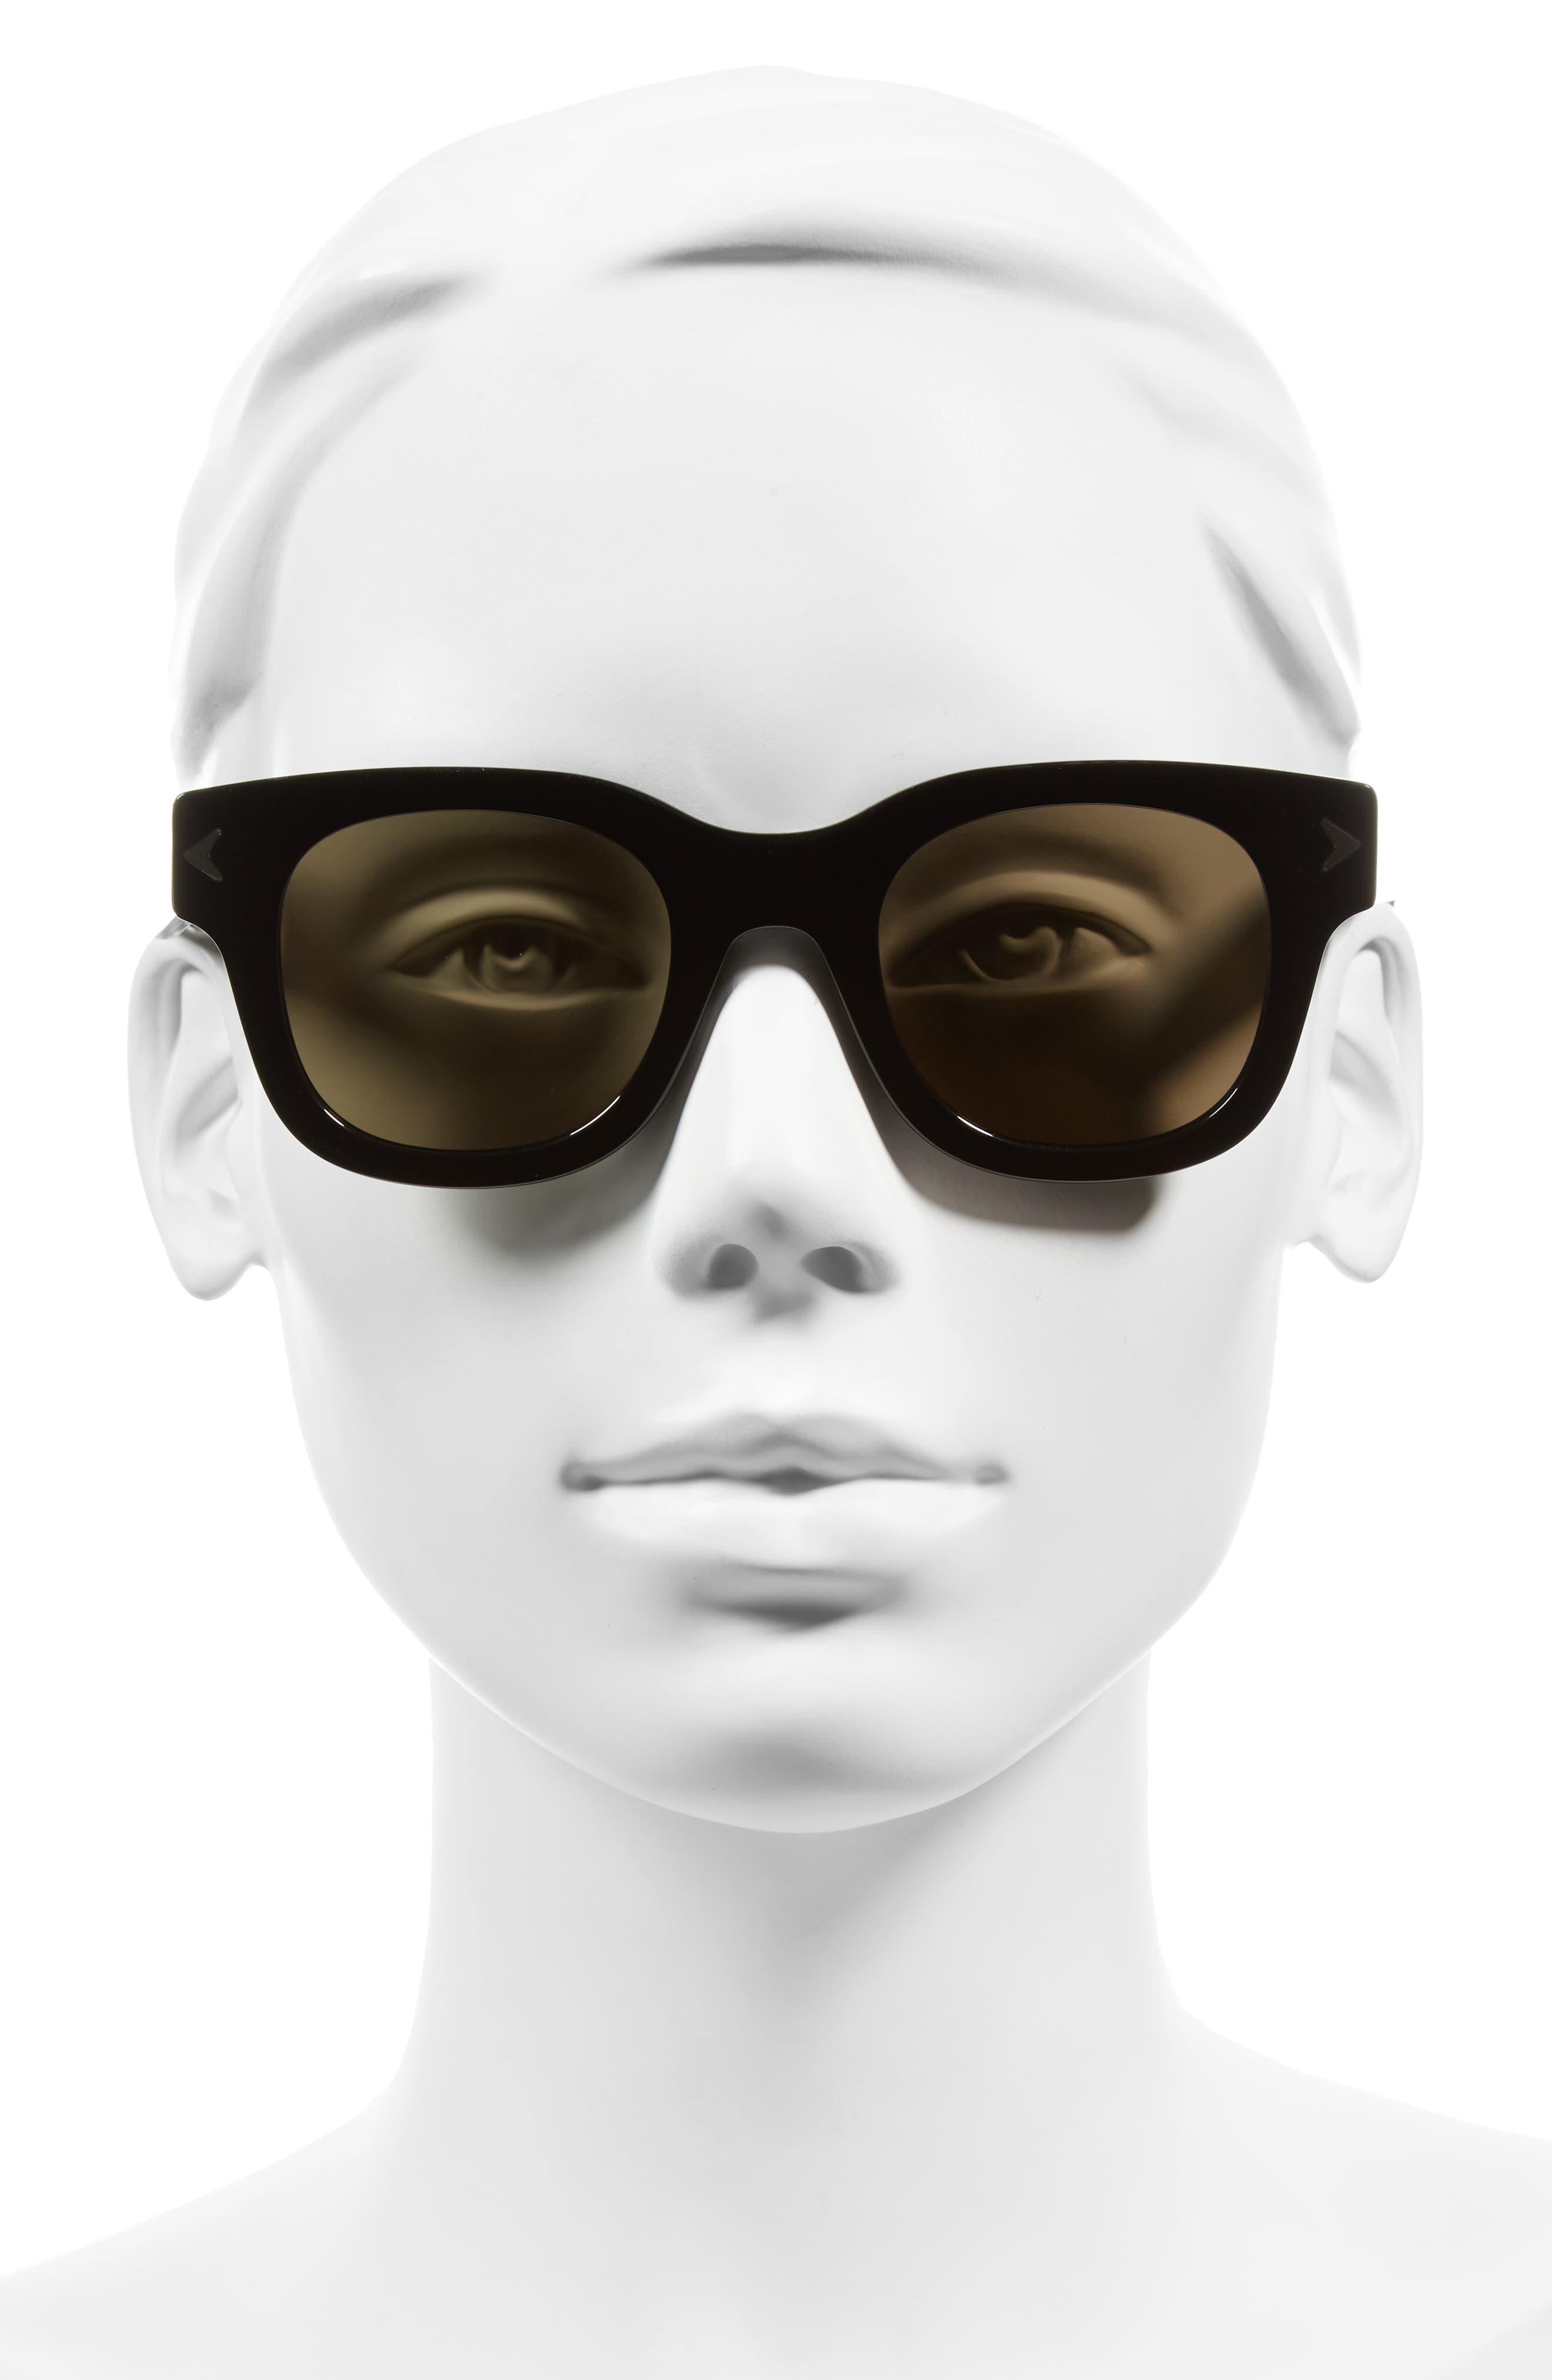 47mm Gradient Sunglasses,                             Alternate thumbnail 4, color,                             002